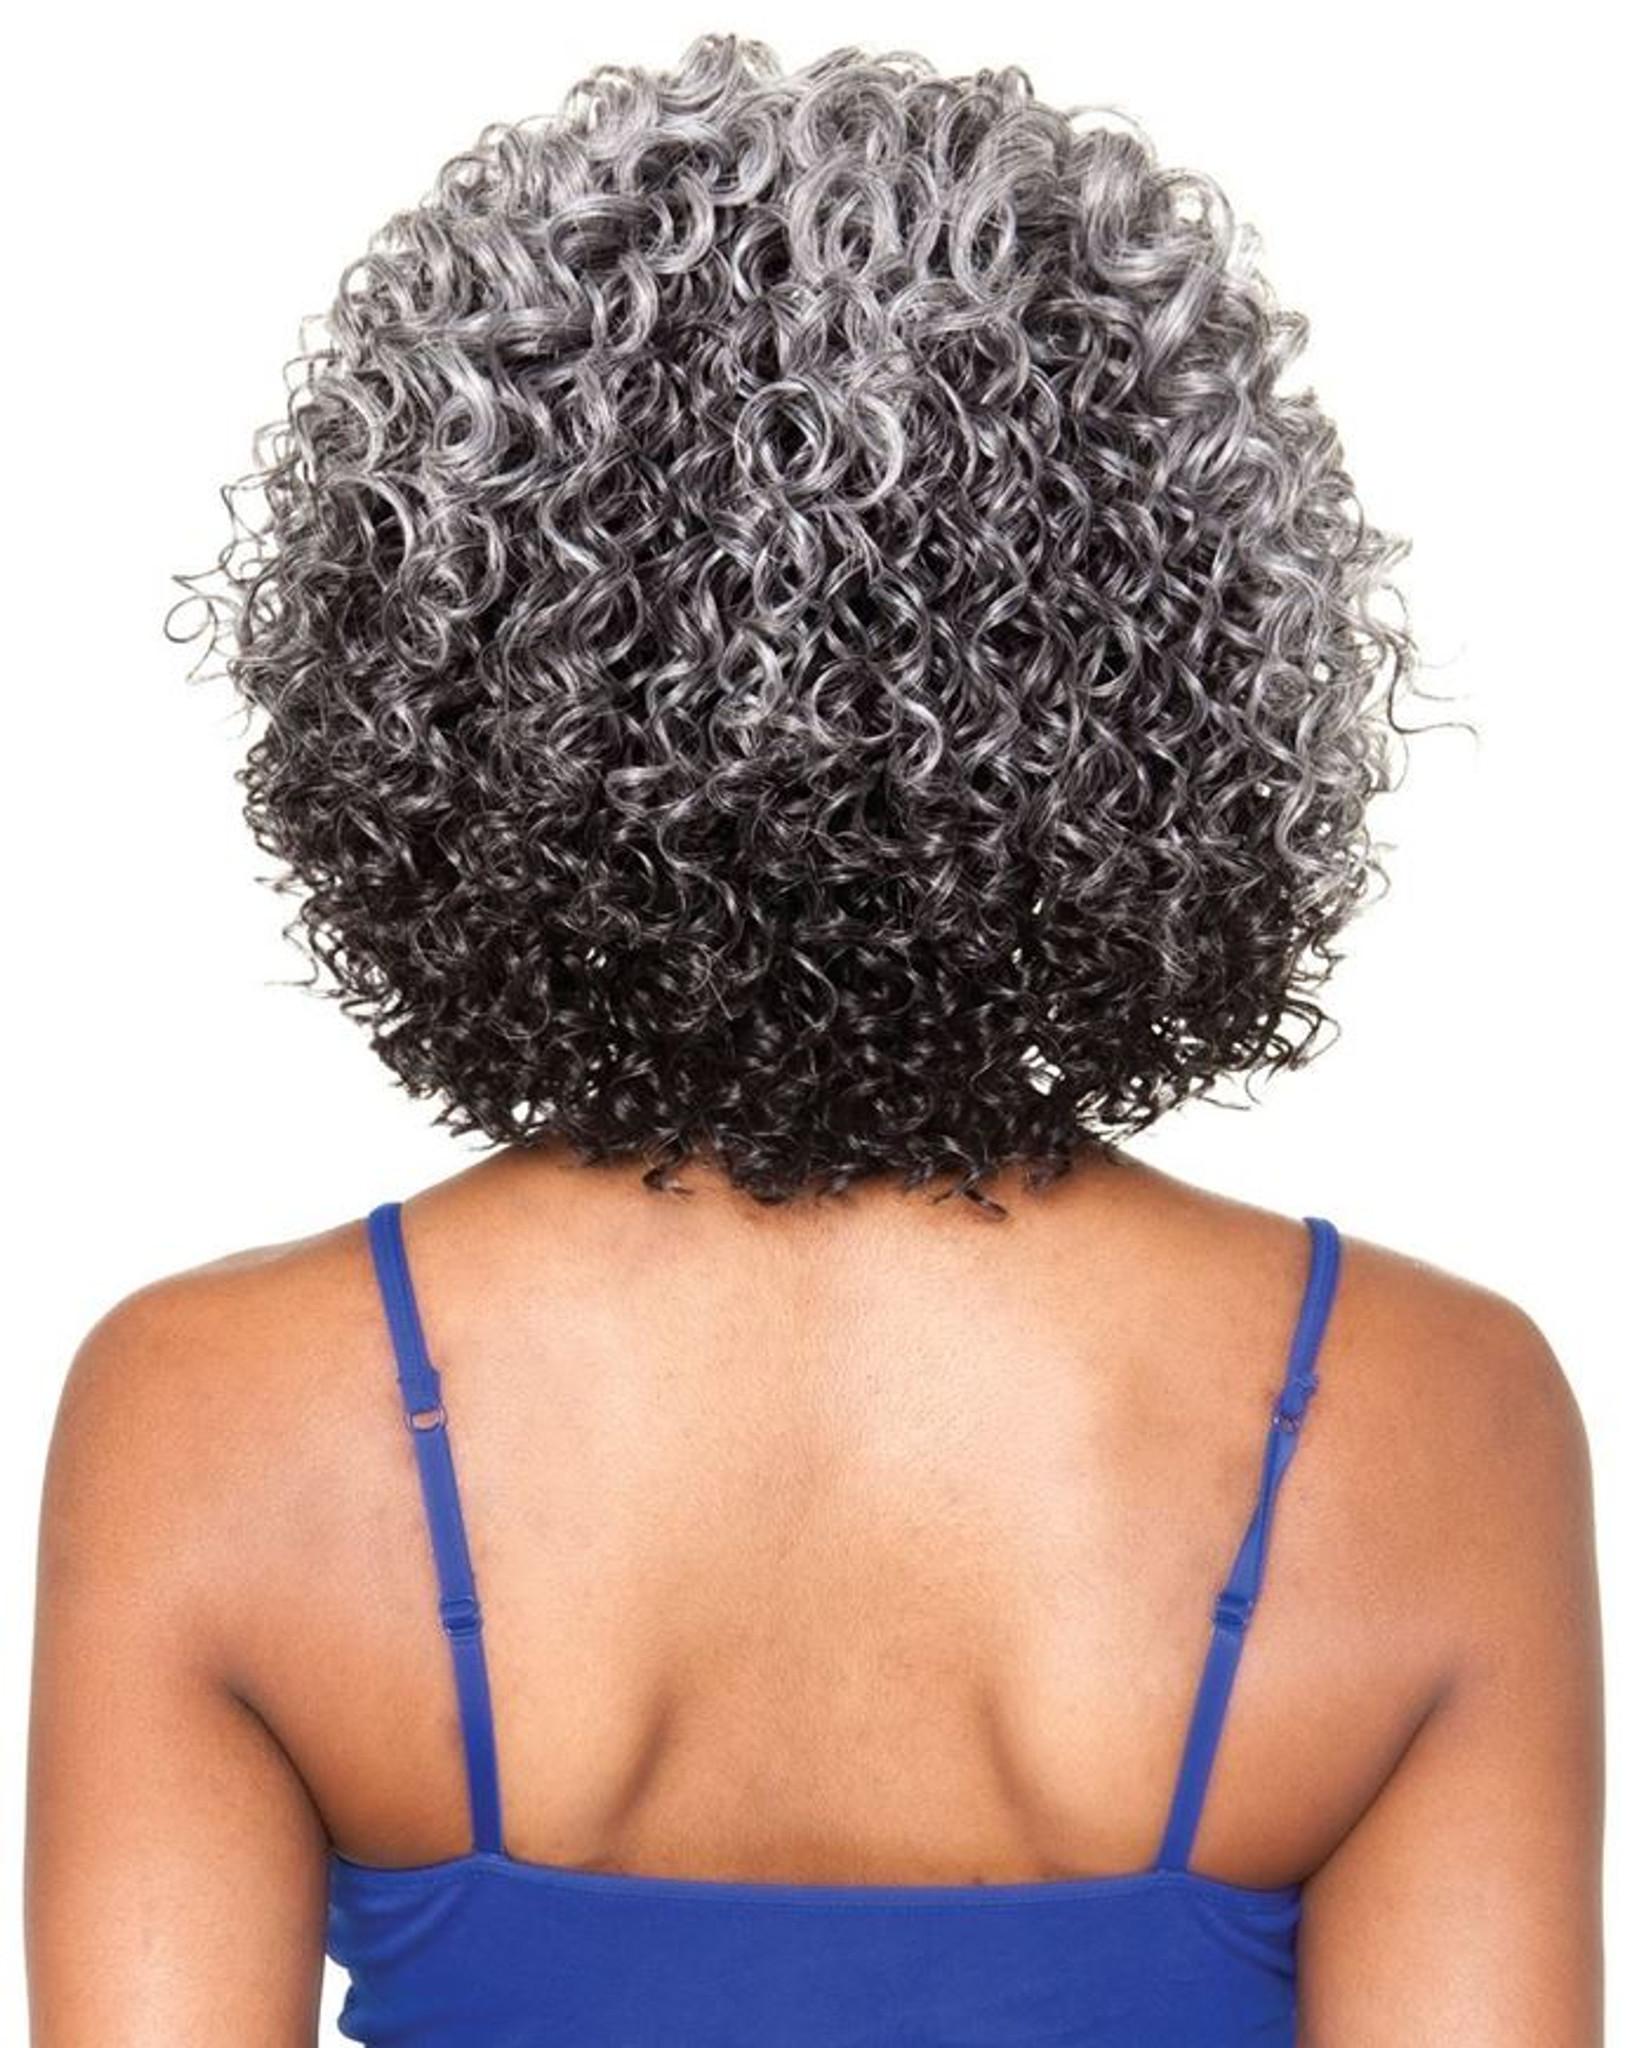 Isis Wigs (Catwalk 7)